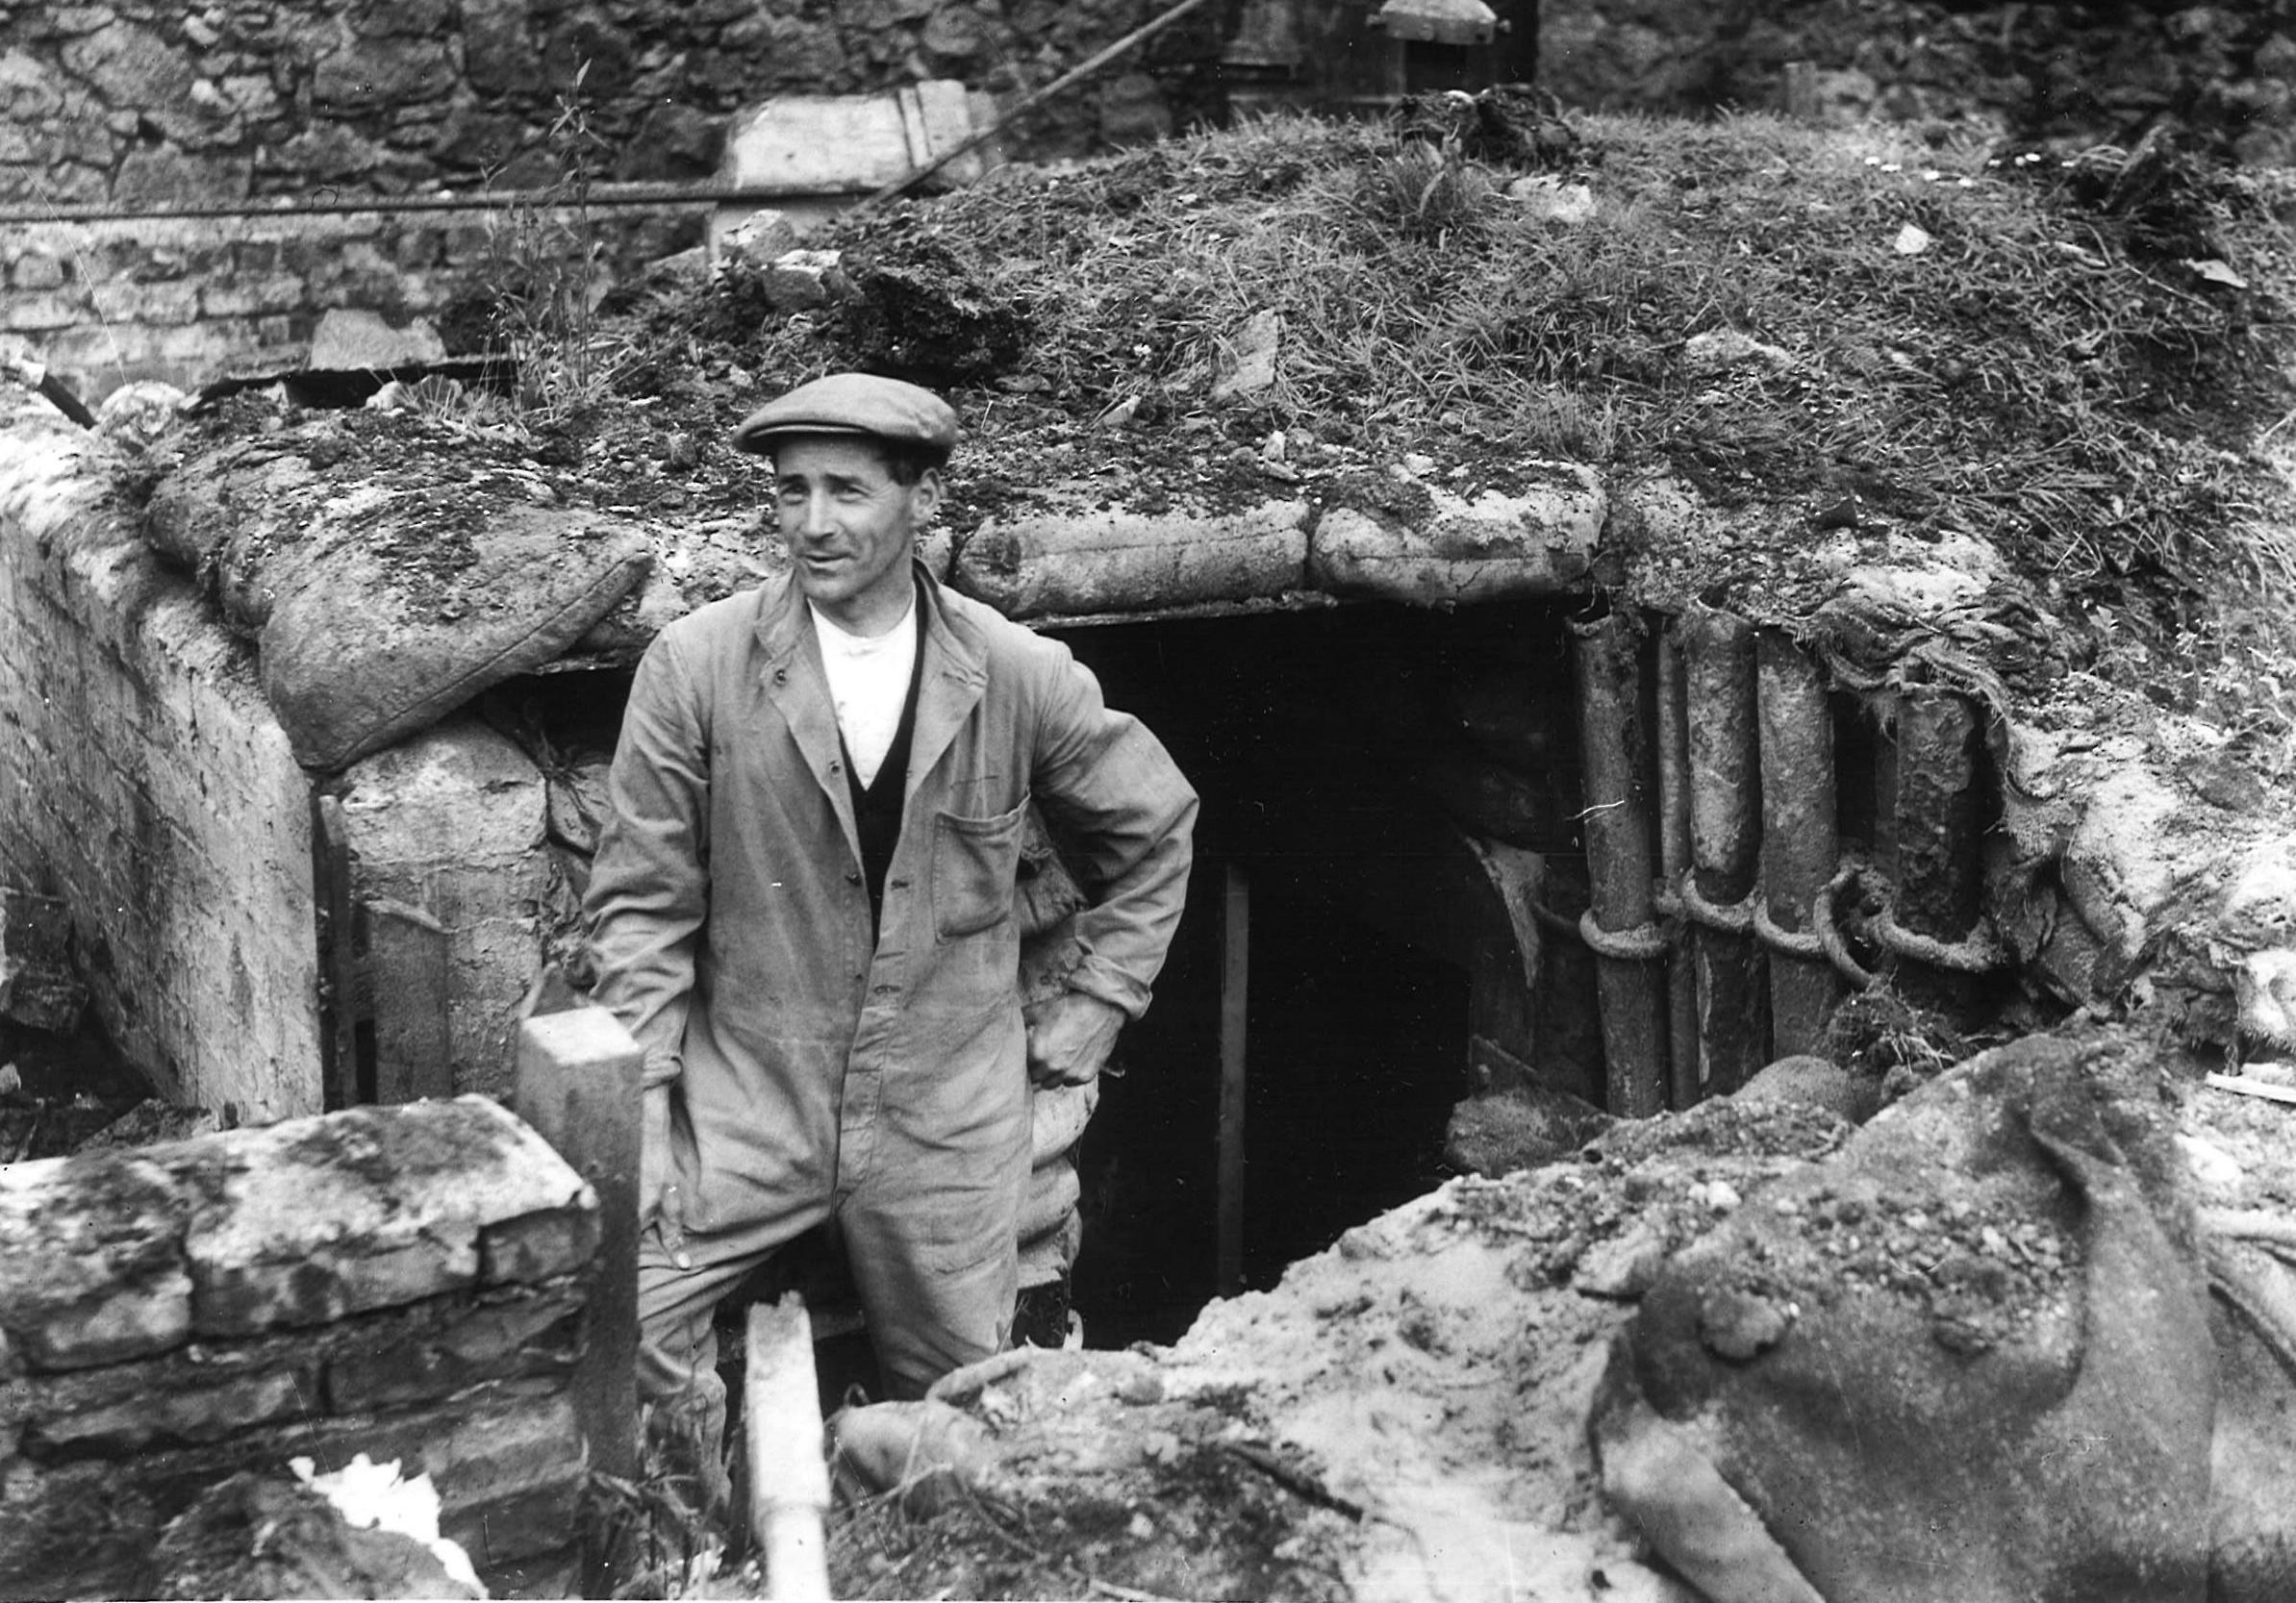 Bomb damage in Peterhead, 10 August 1941